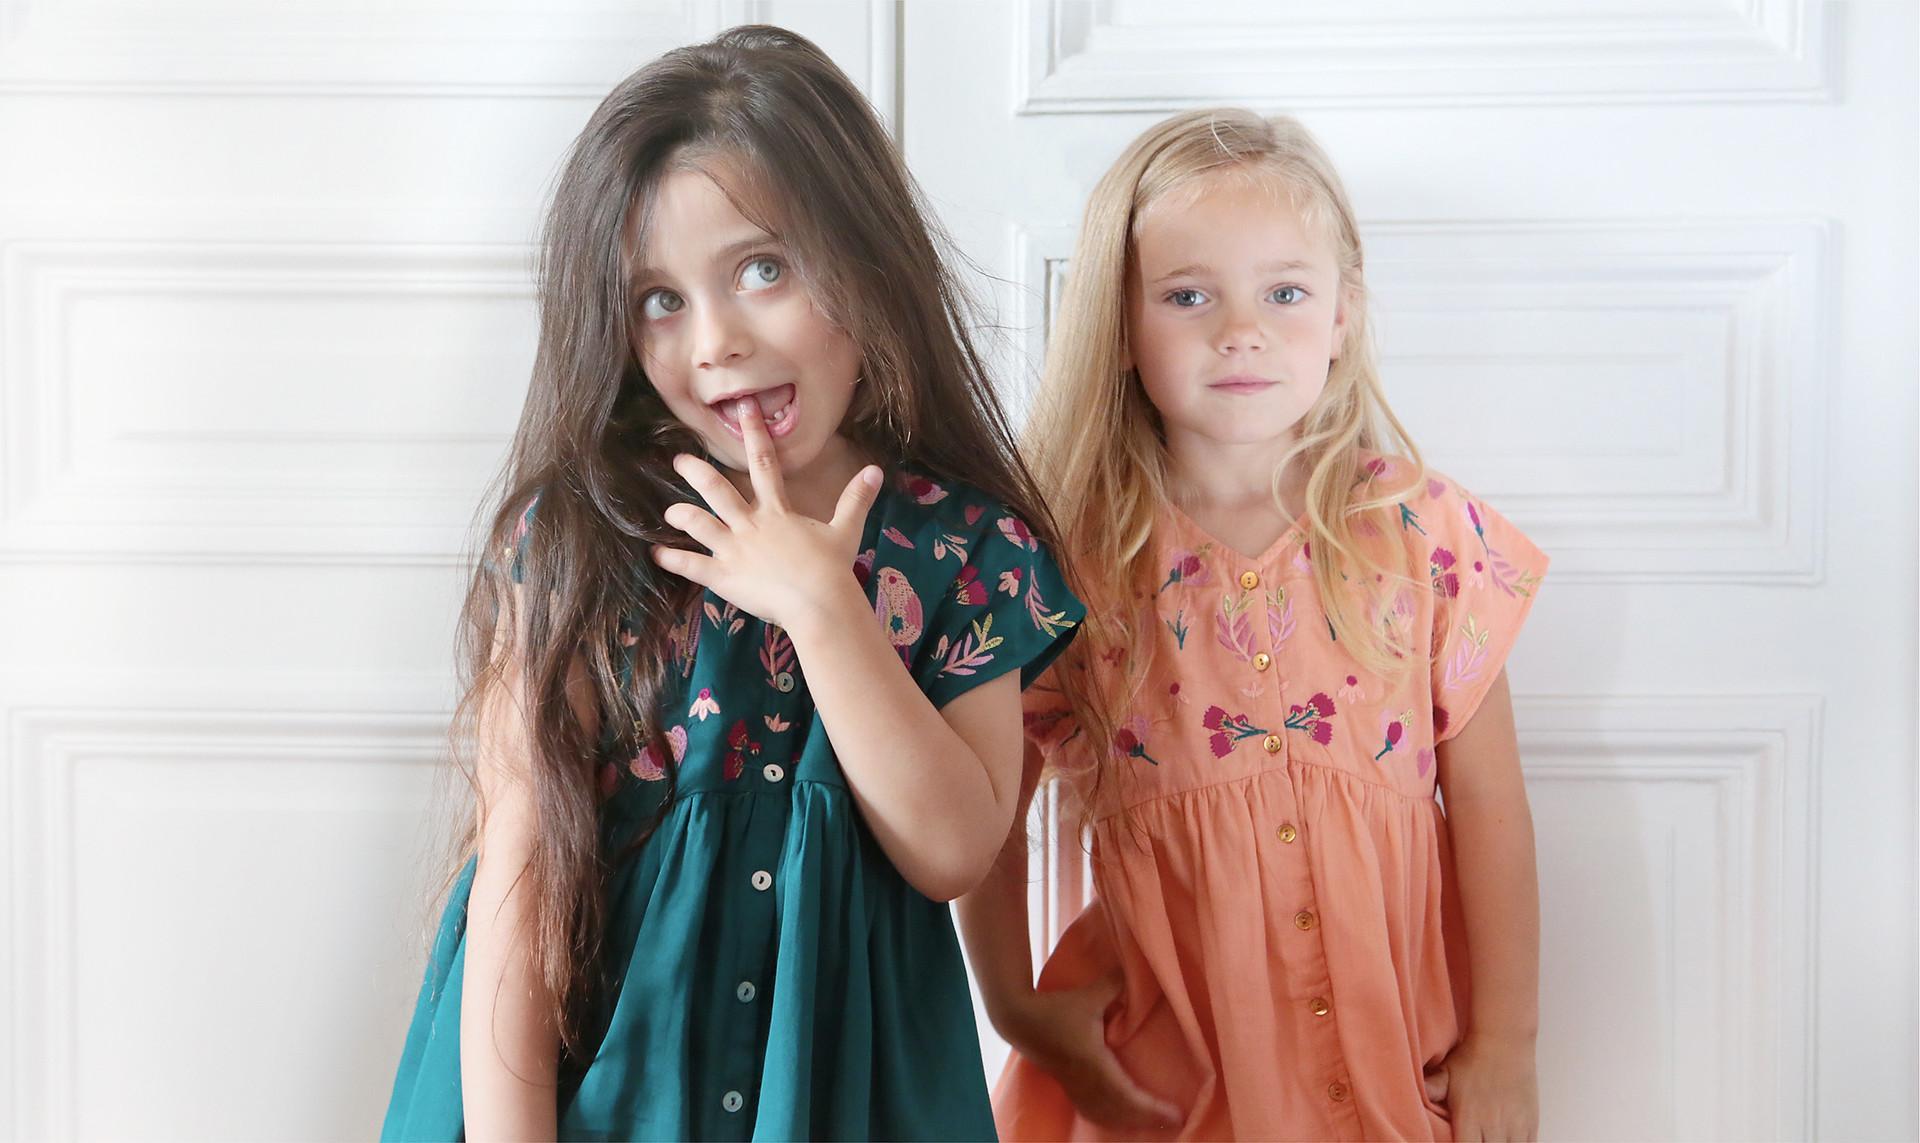 European Kids Outfits